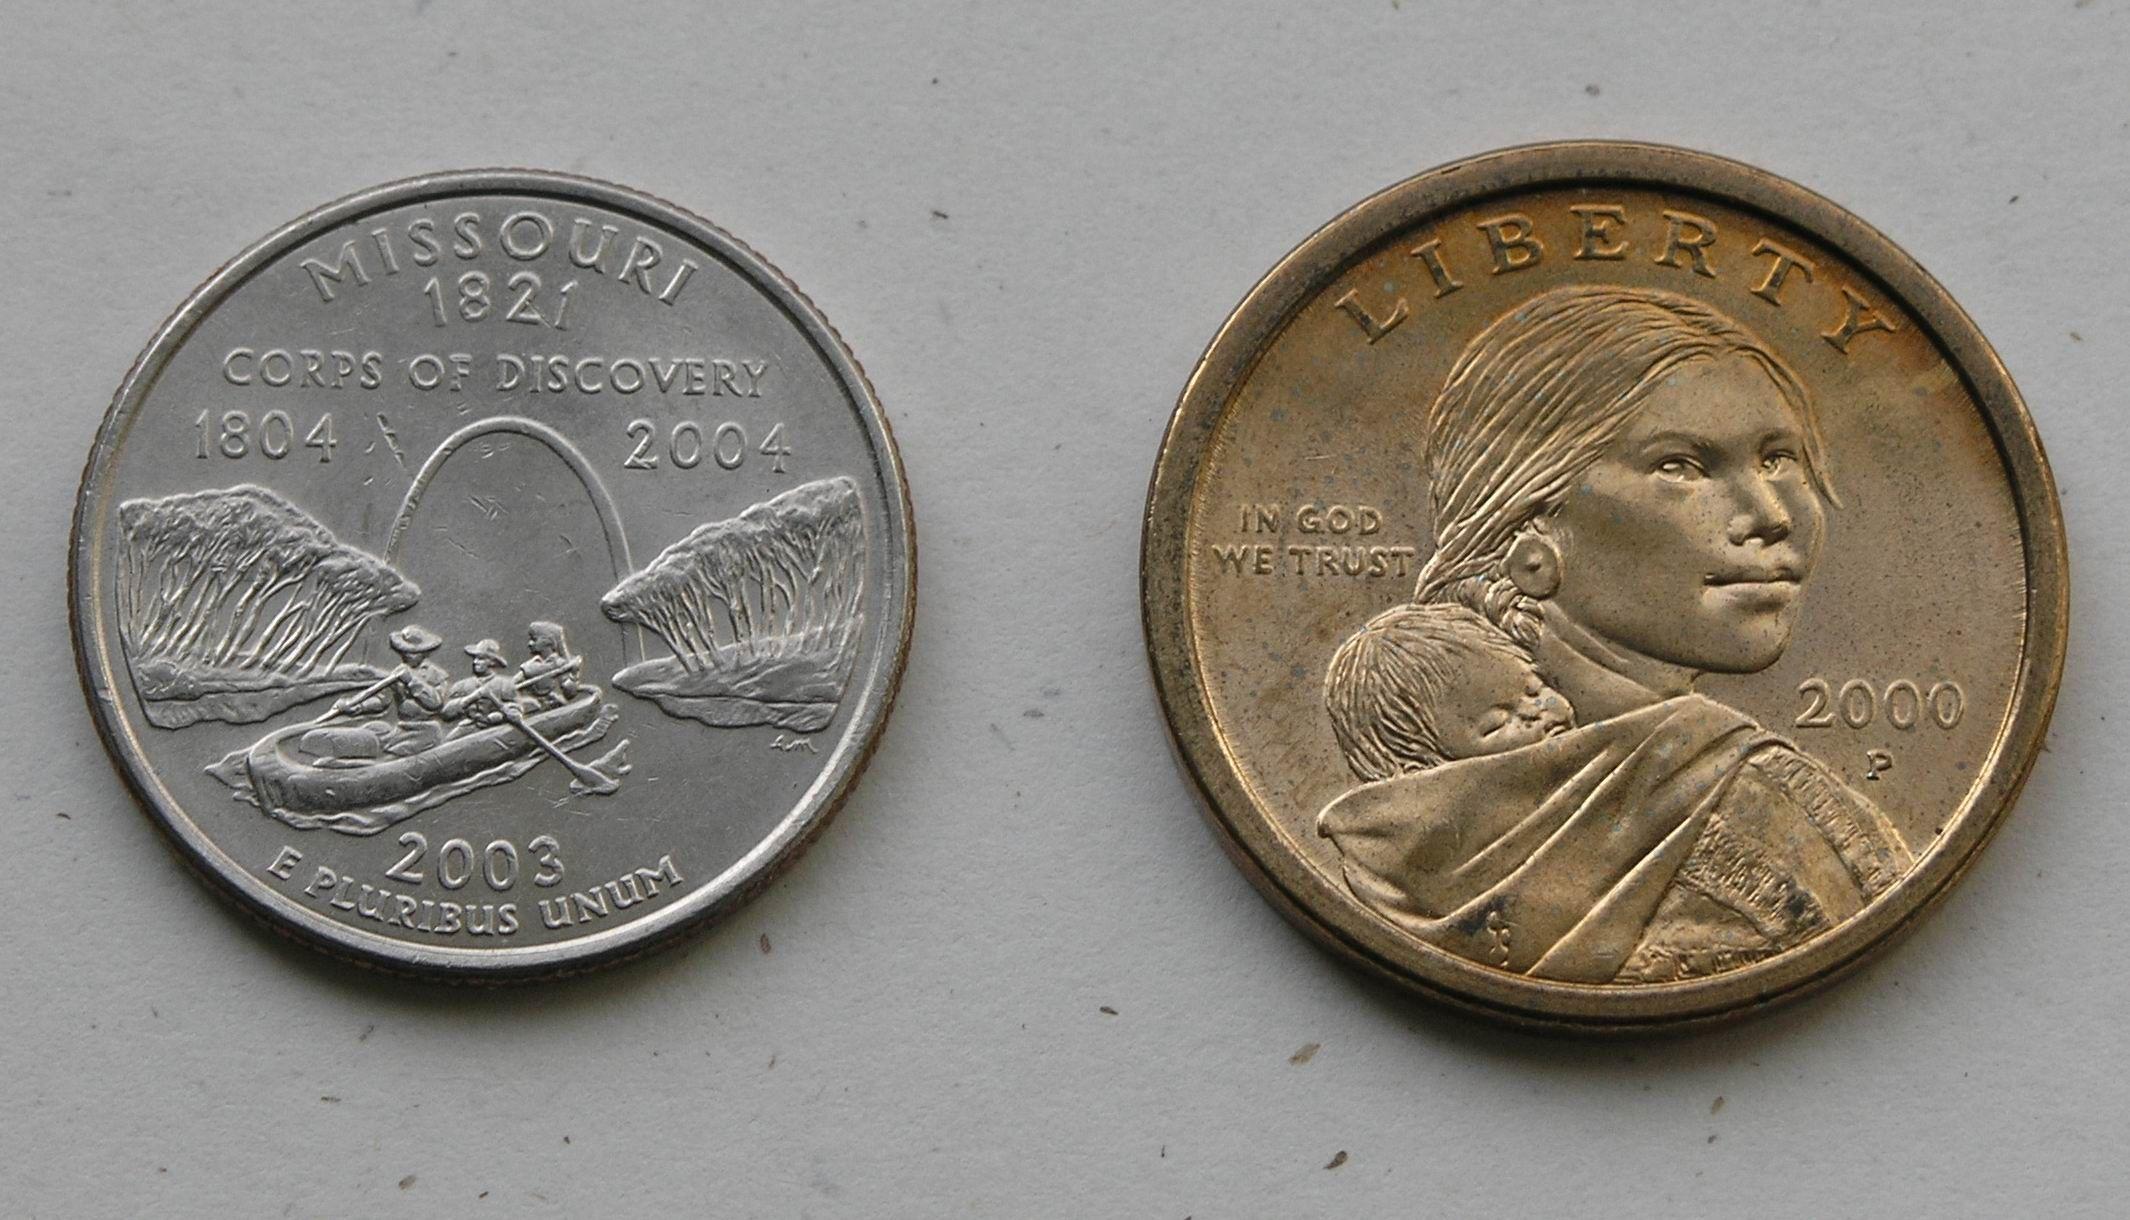 Missouri State Quarter And Sacagawea Dollar Coin